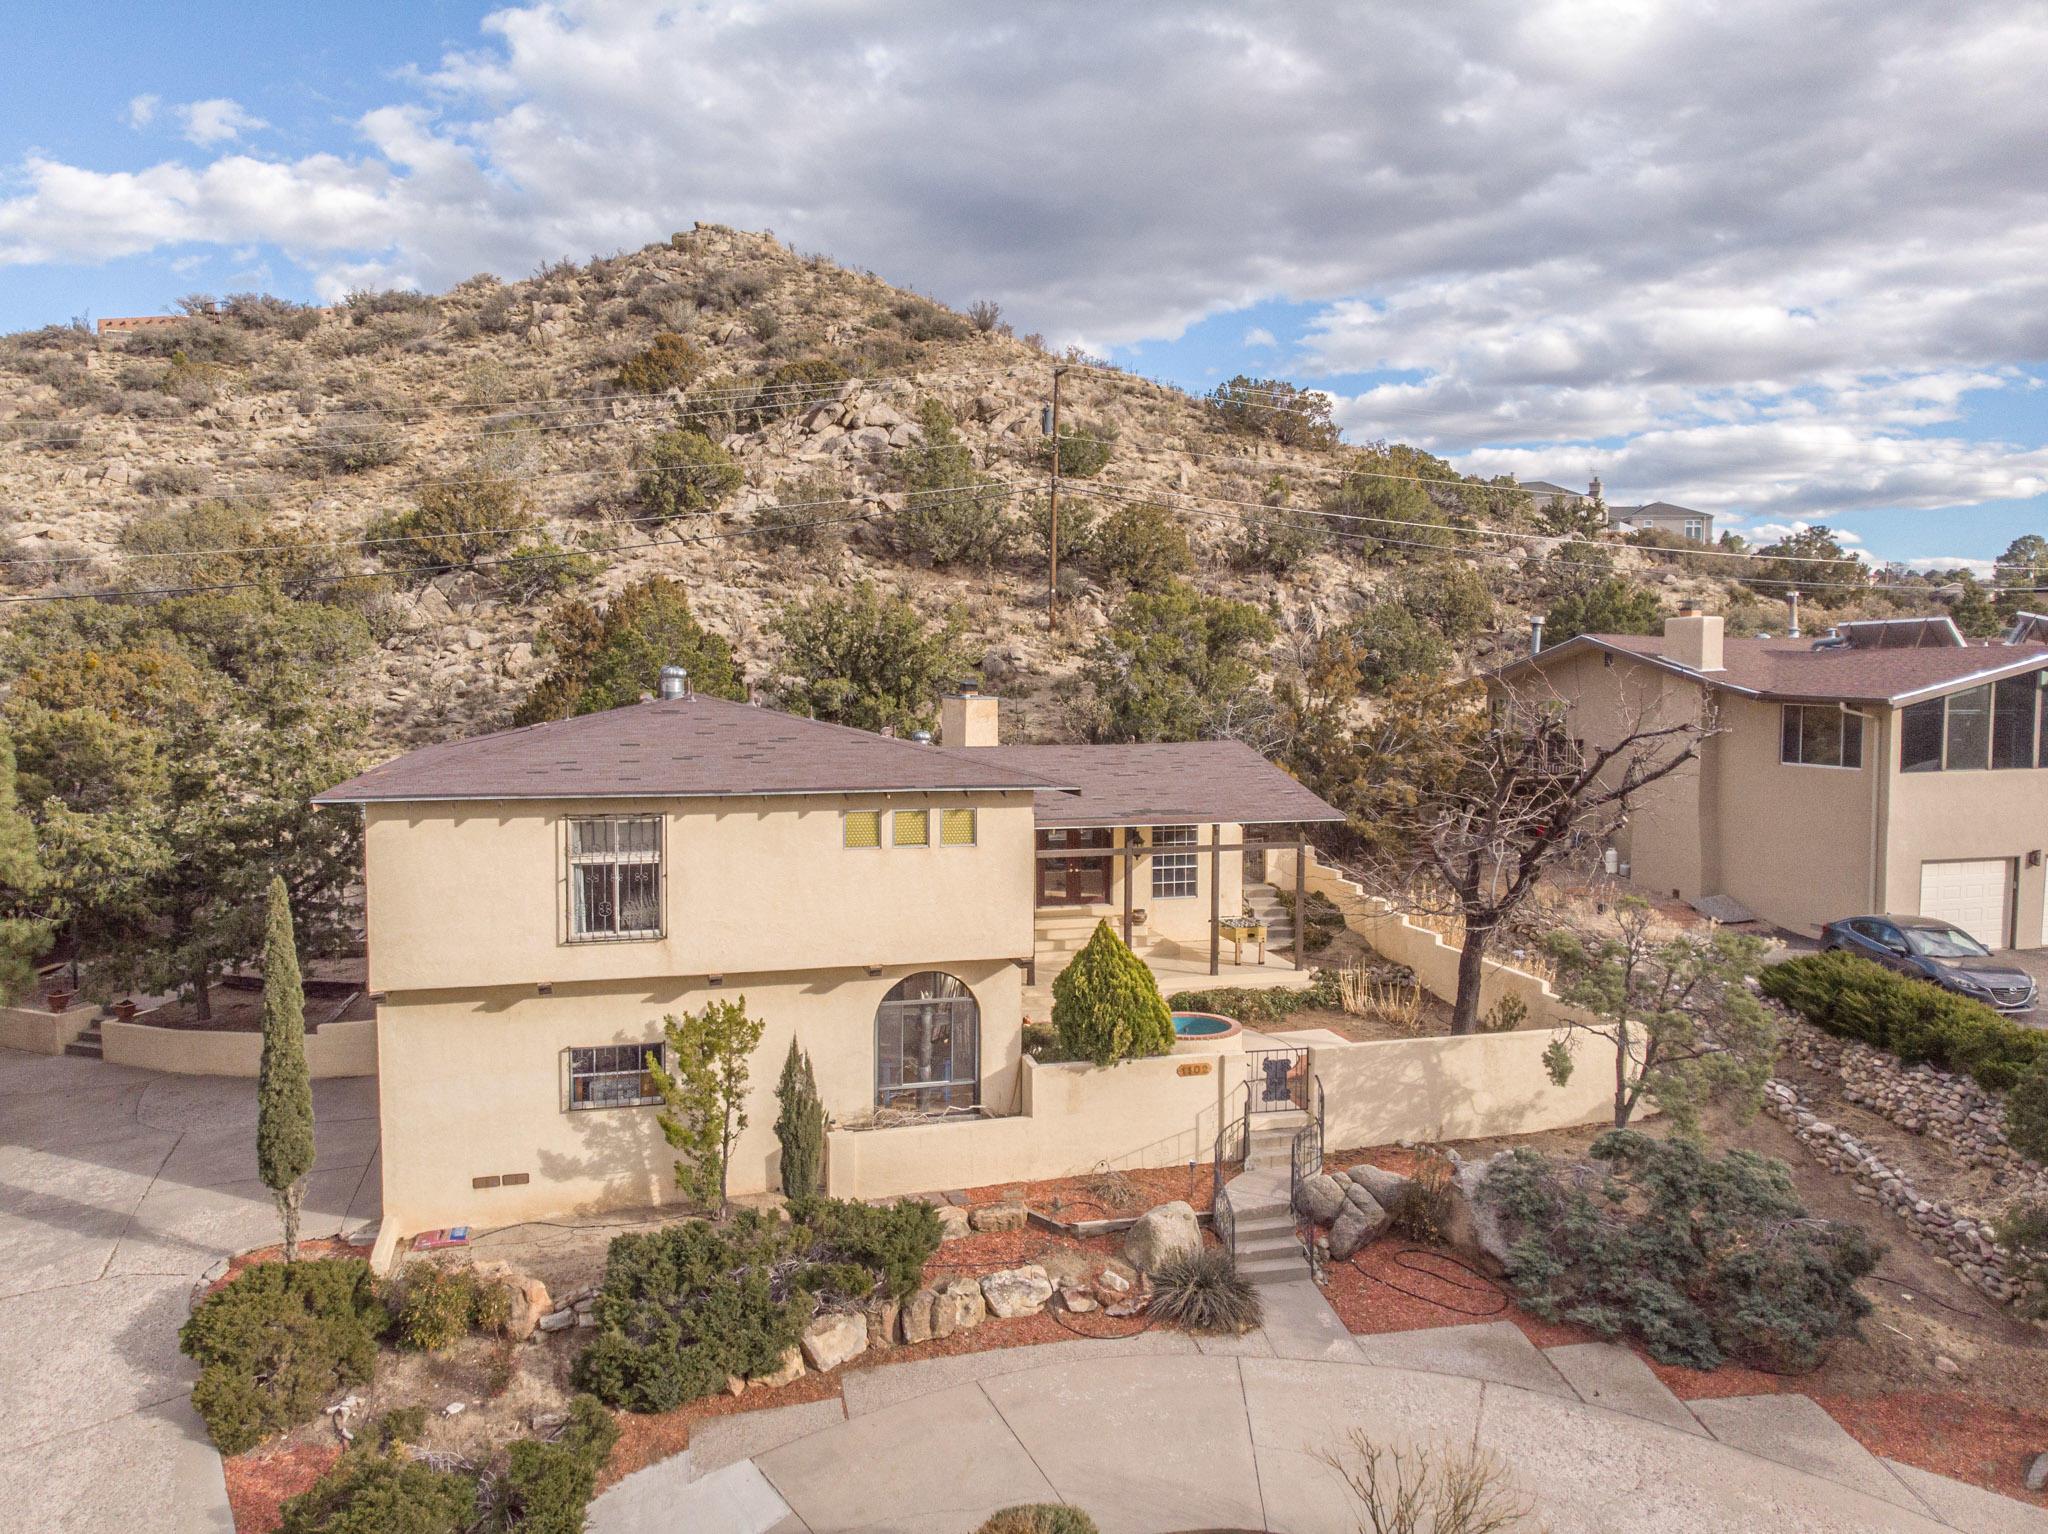 1102 WARM SANDS Drive SE Property Photo - Albuquerque, NM real estate listing